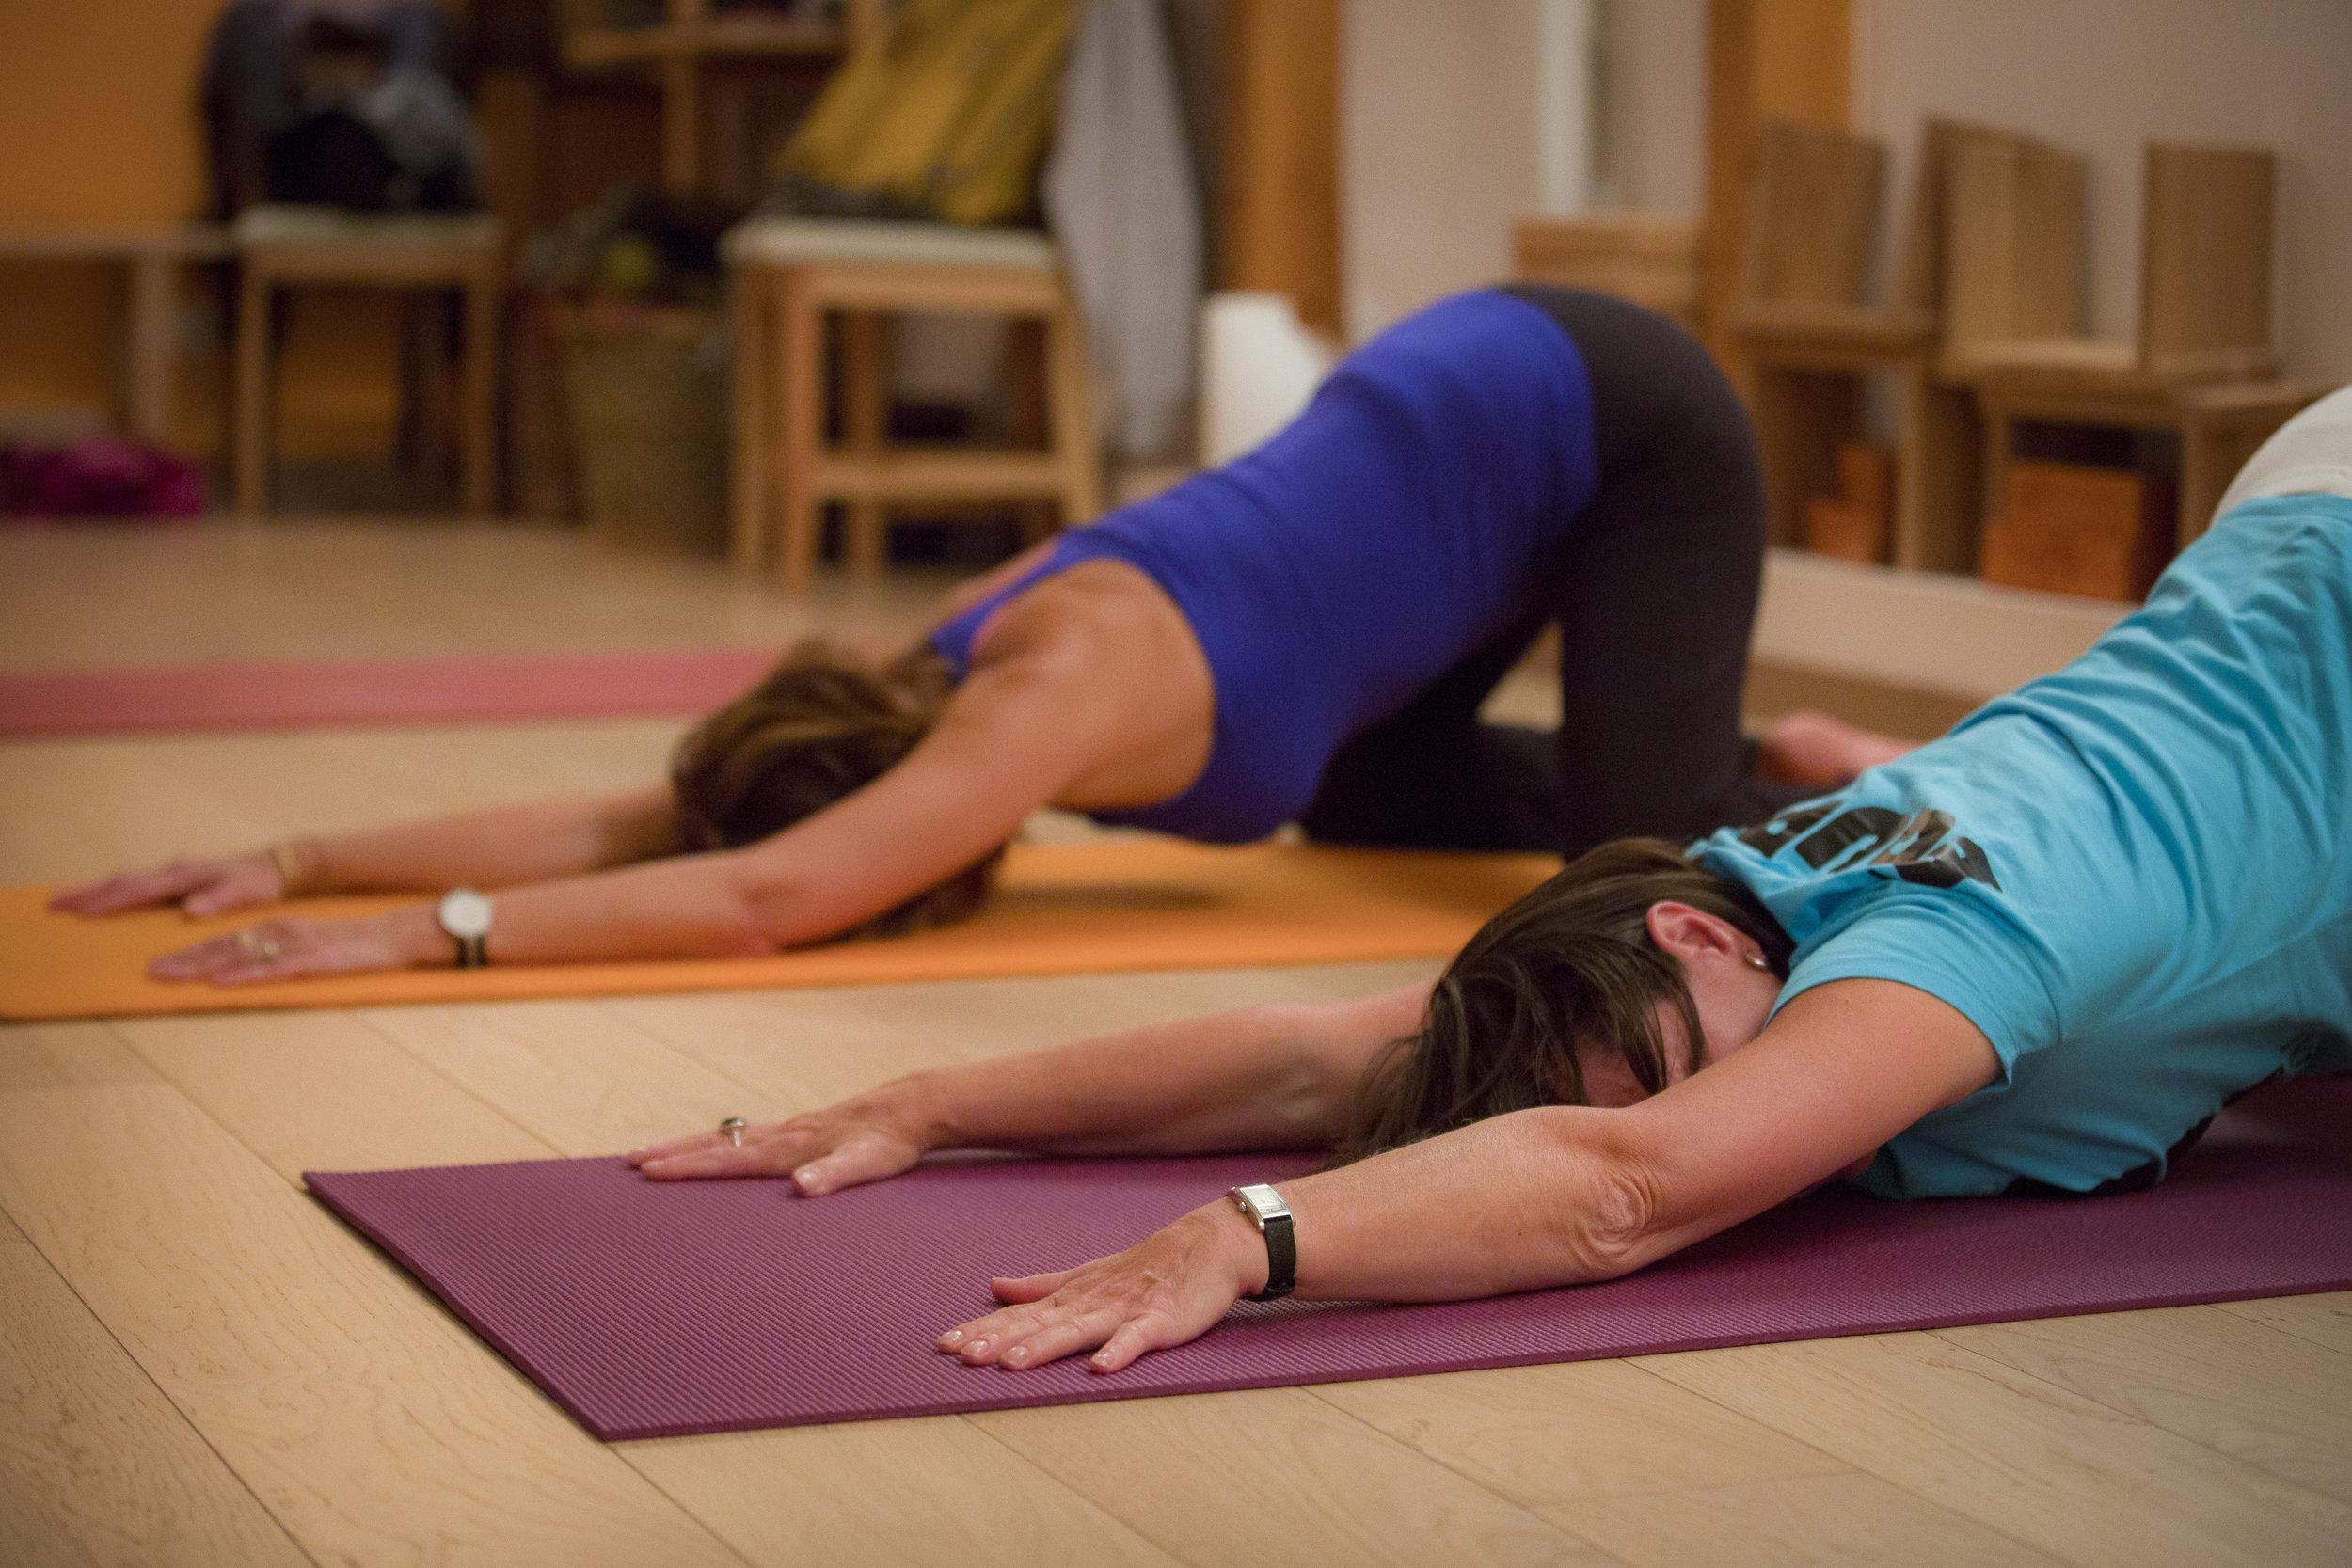 yoga-cachemire-fontenay-sous-bois.jpg